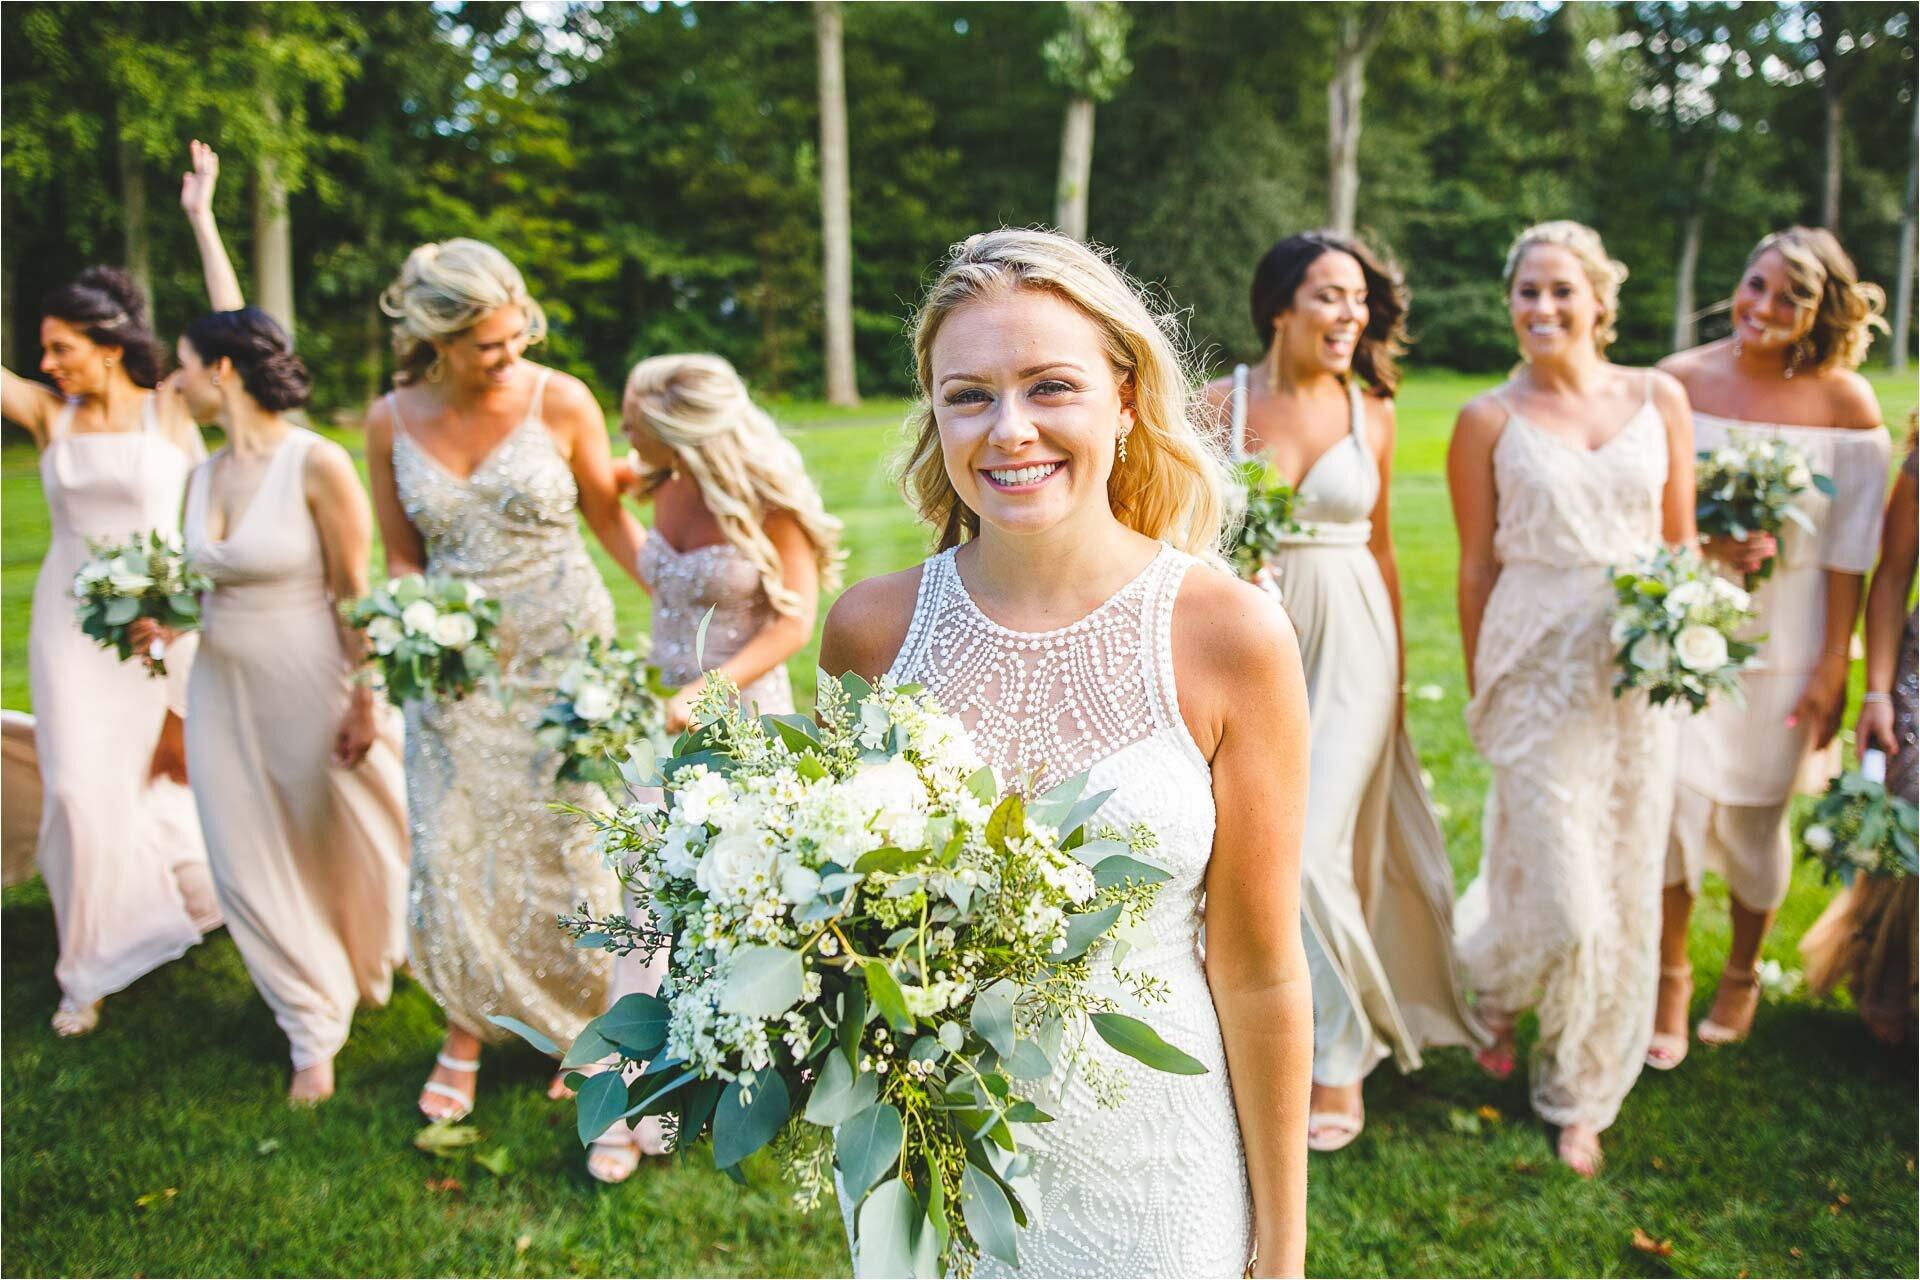 racebrook-countryclub-wedding-photography-19.jpg